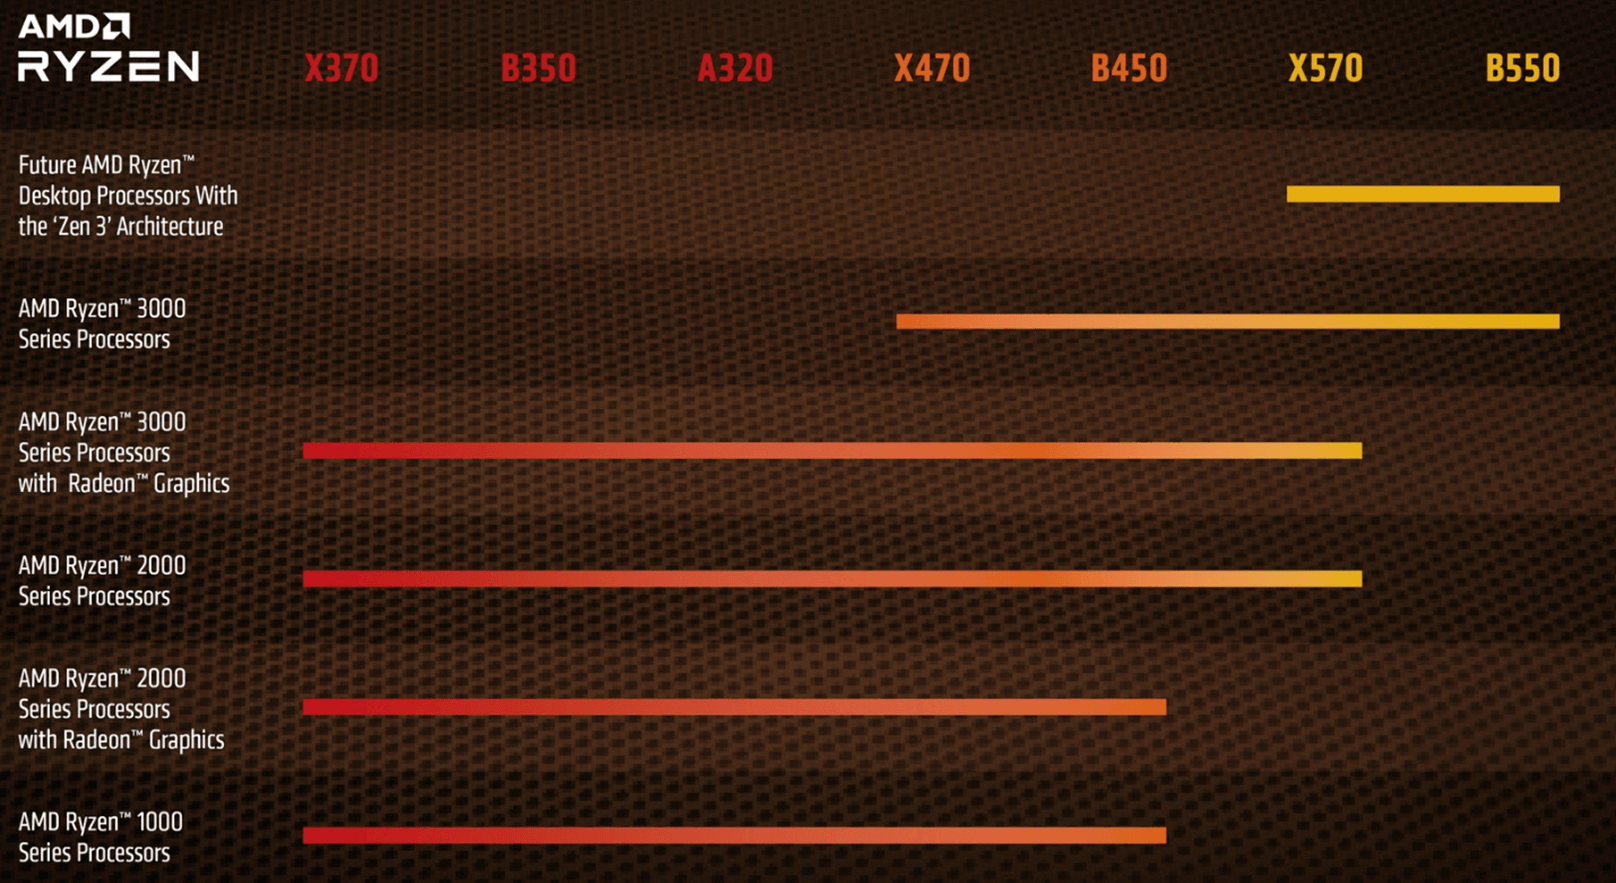 AMD از سازگاری مادربرد X570 و B550 با معماری Zen 3 خبر داد